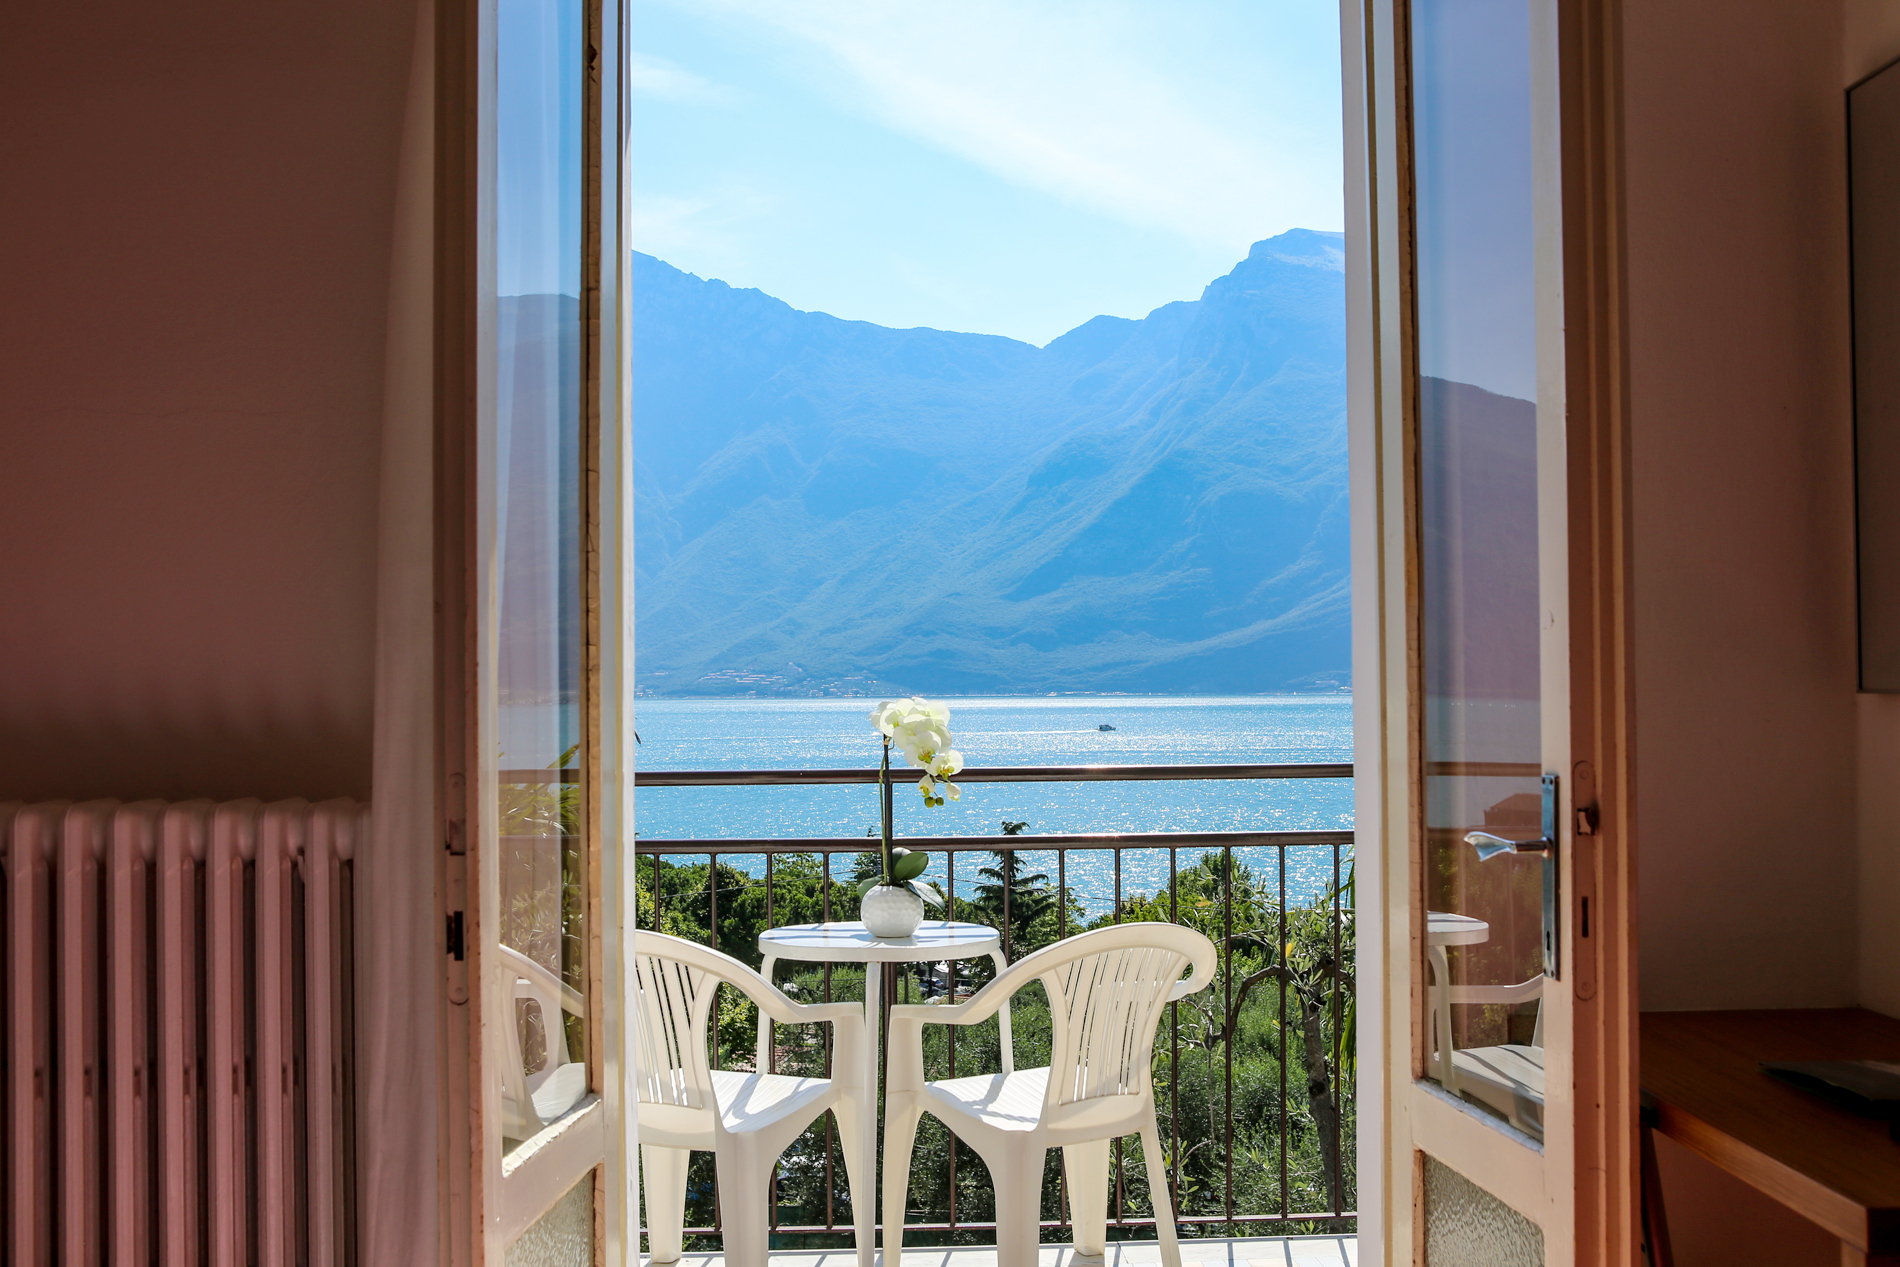 limone_sul_garda_hotel_silvana_camera_vista_lago207.jpg